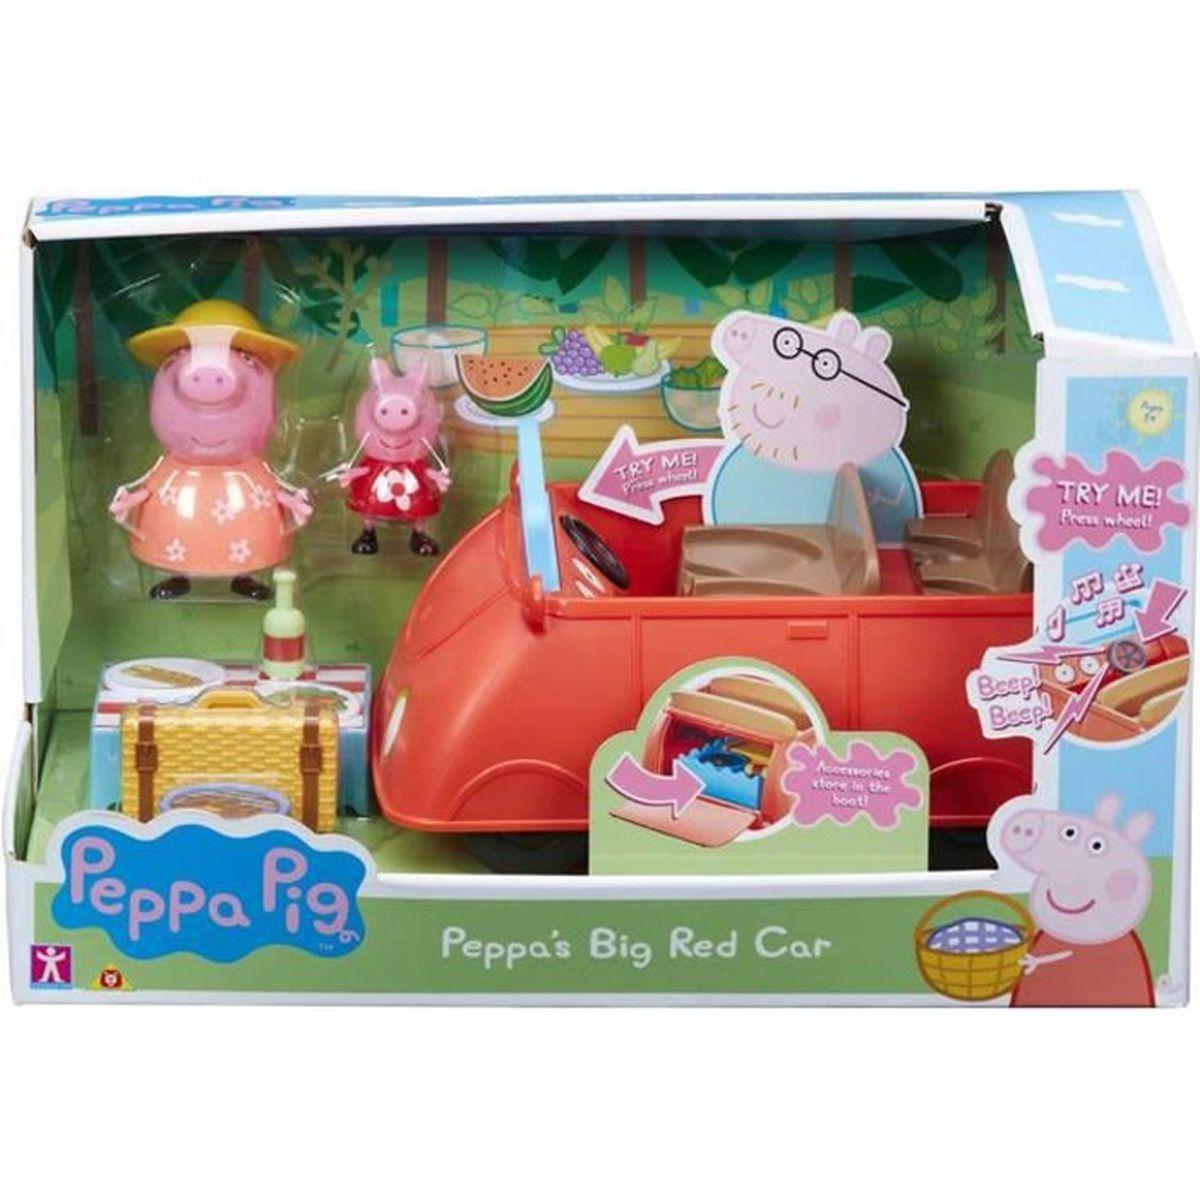 Peppa Pig Big Red Car Avec Sons Et Accessoires Achat Vente Figurine Personnage Cdiscount